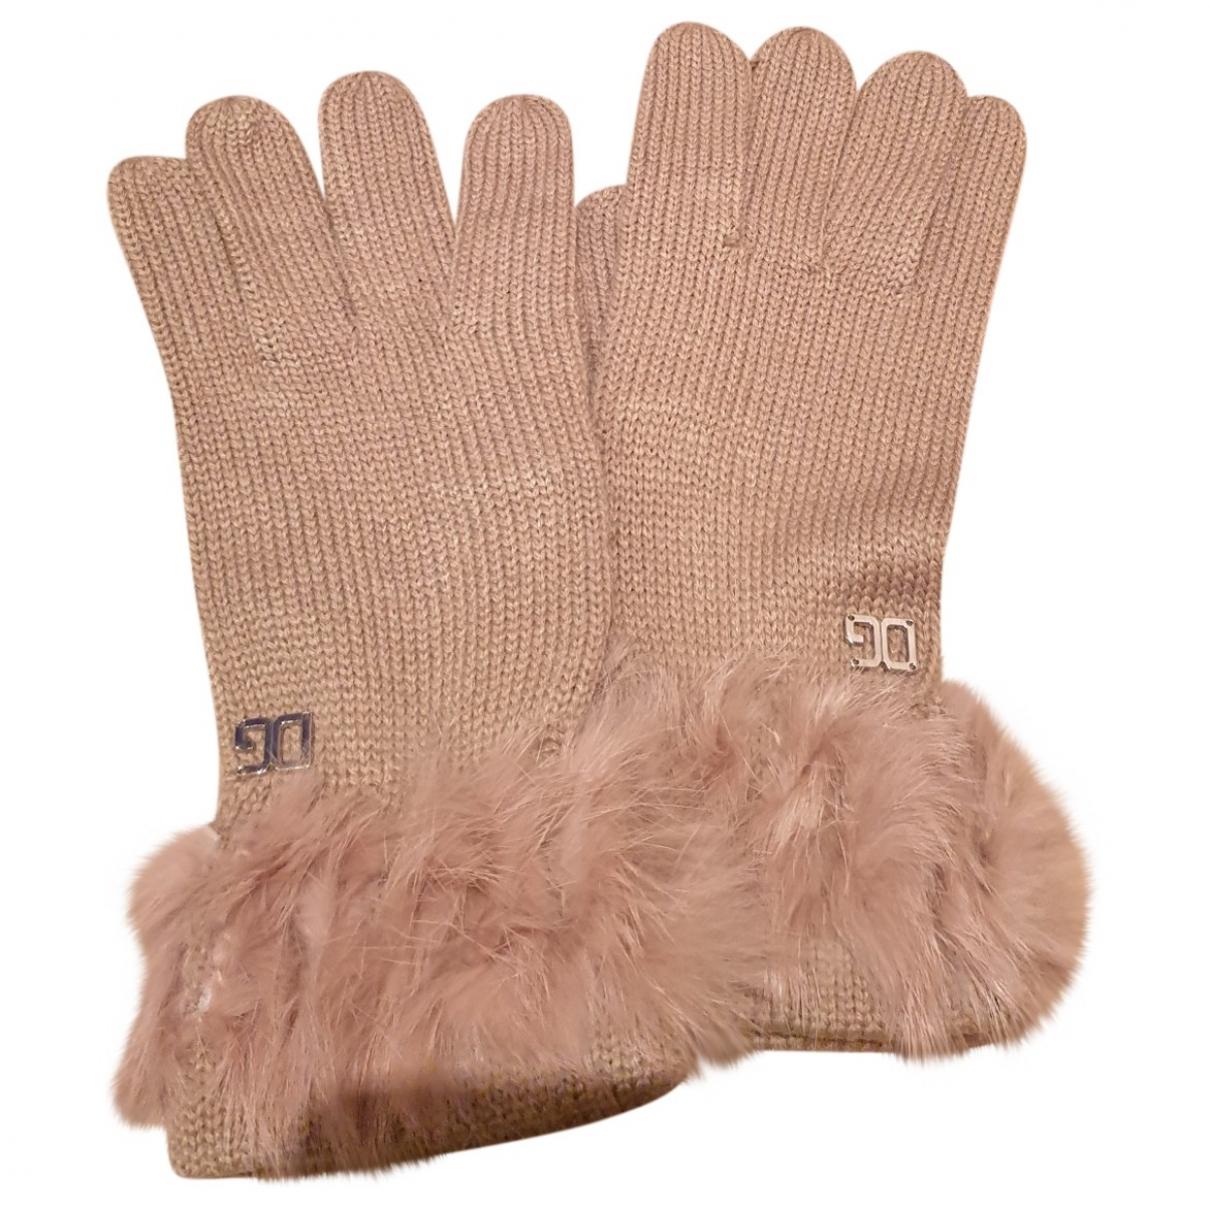 Dolce & Gabbana \N Beige Wool Gloves for Women M International